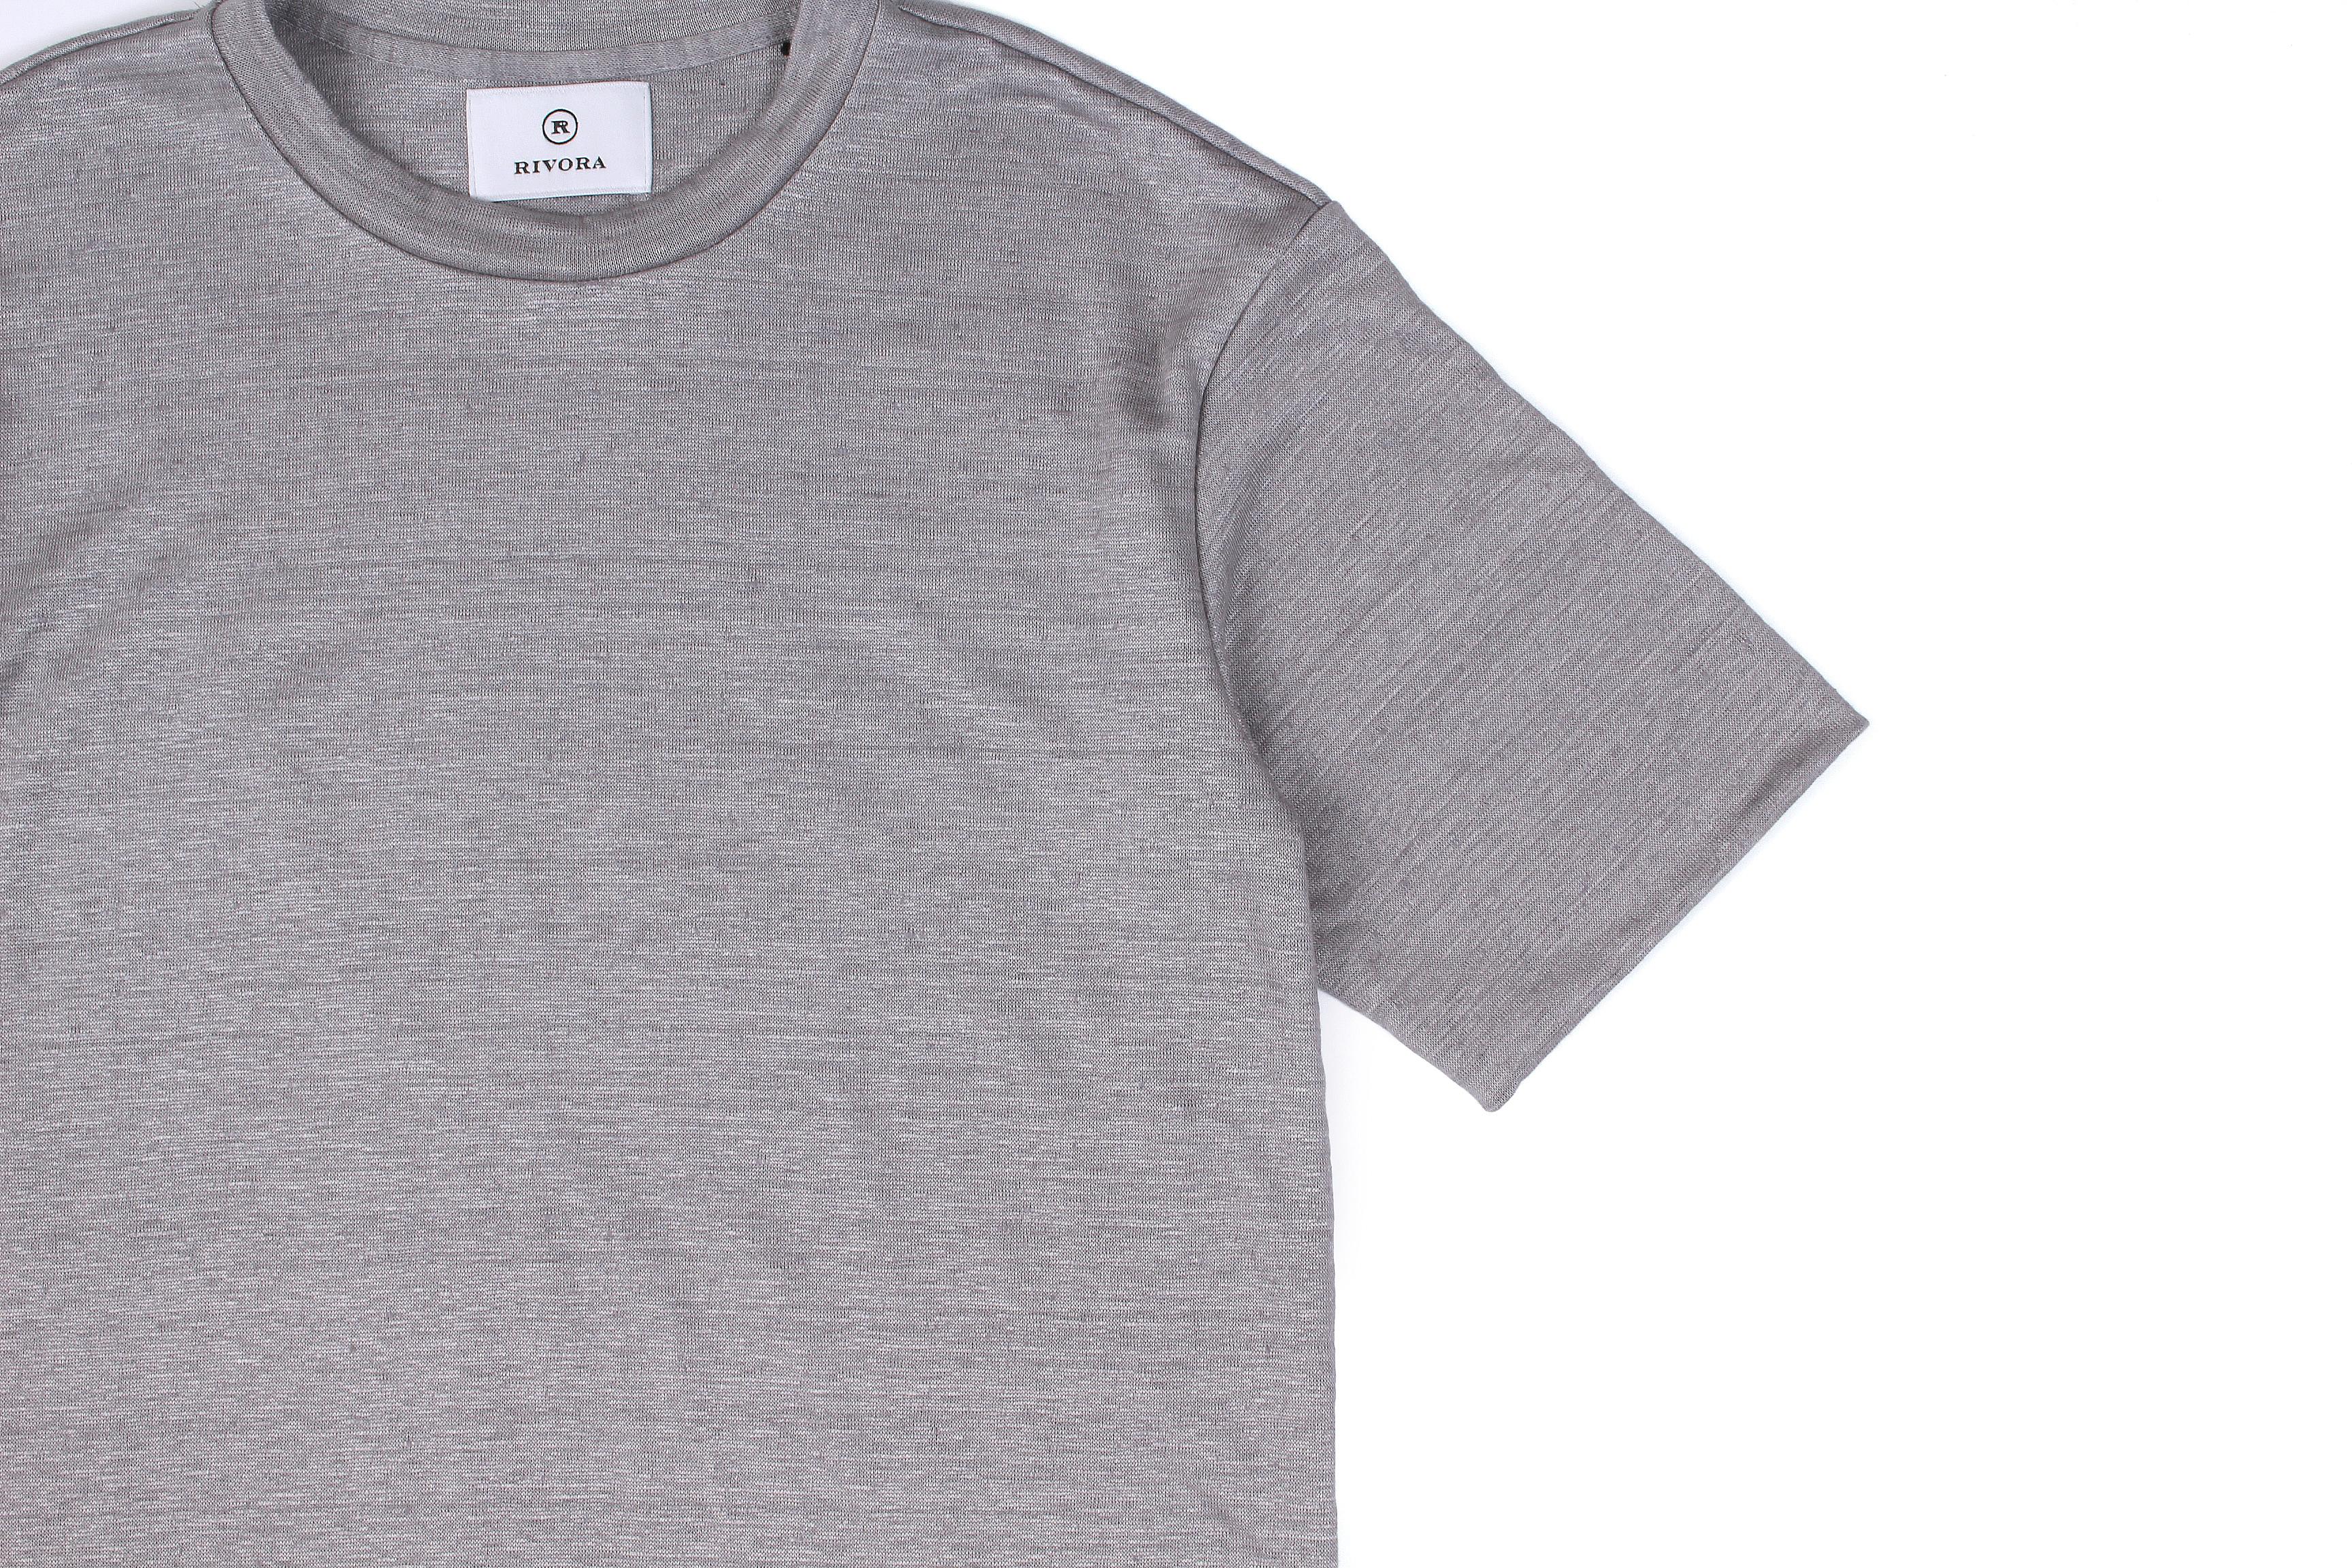 RIVORA (リヴォラ) Vintage Linen Layered T-Shirts ヴィンテージ リネン レイヤード Tシャツ GRAY (グレー・020) MADE IN JAPAN (日本製) 2021 春夏新作 【入荷しました】【フリー分発売開始】愛知 名古屋 Alto e Diritto altoediritto アルトエデリット 半袖TEE